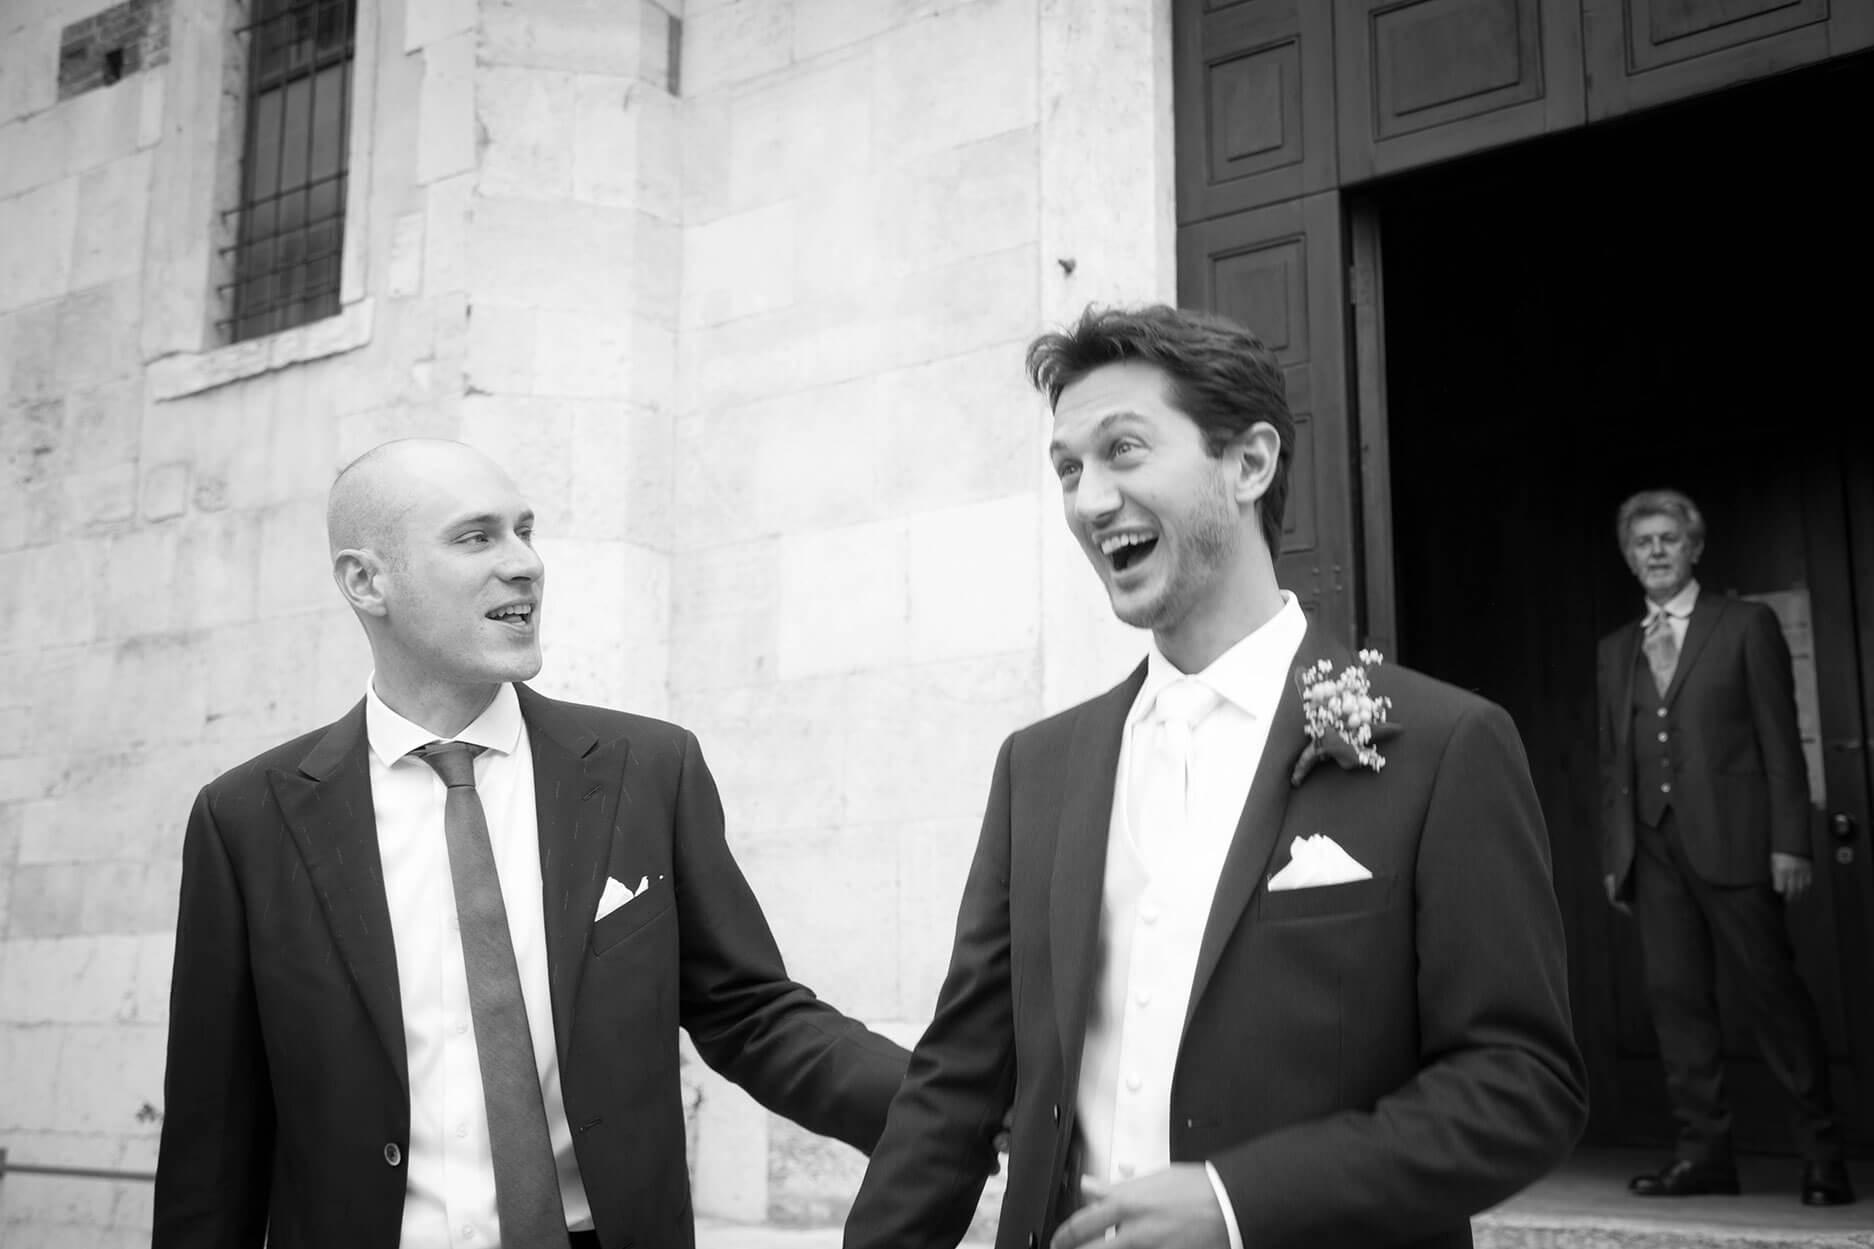 Francesca-Ferrati-wedding-photographer-Verona-Elena-Tommaso5